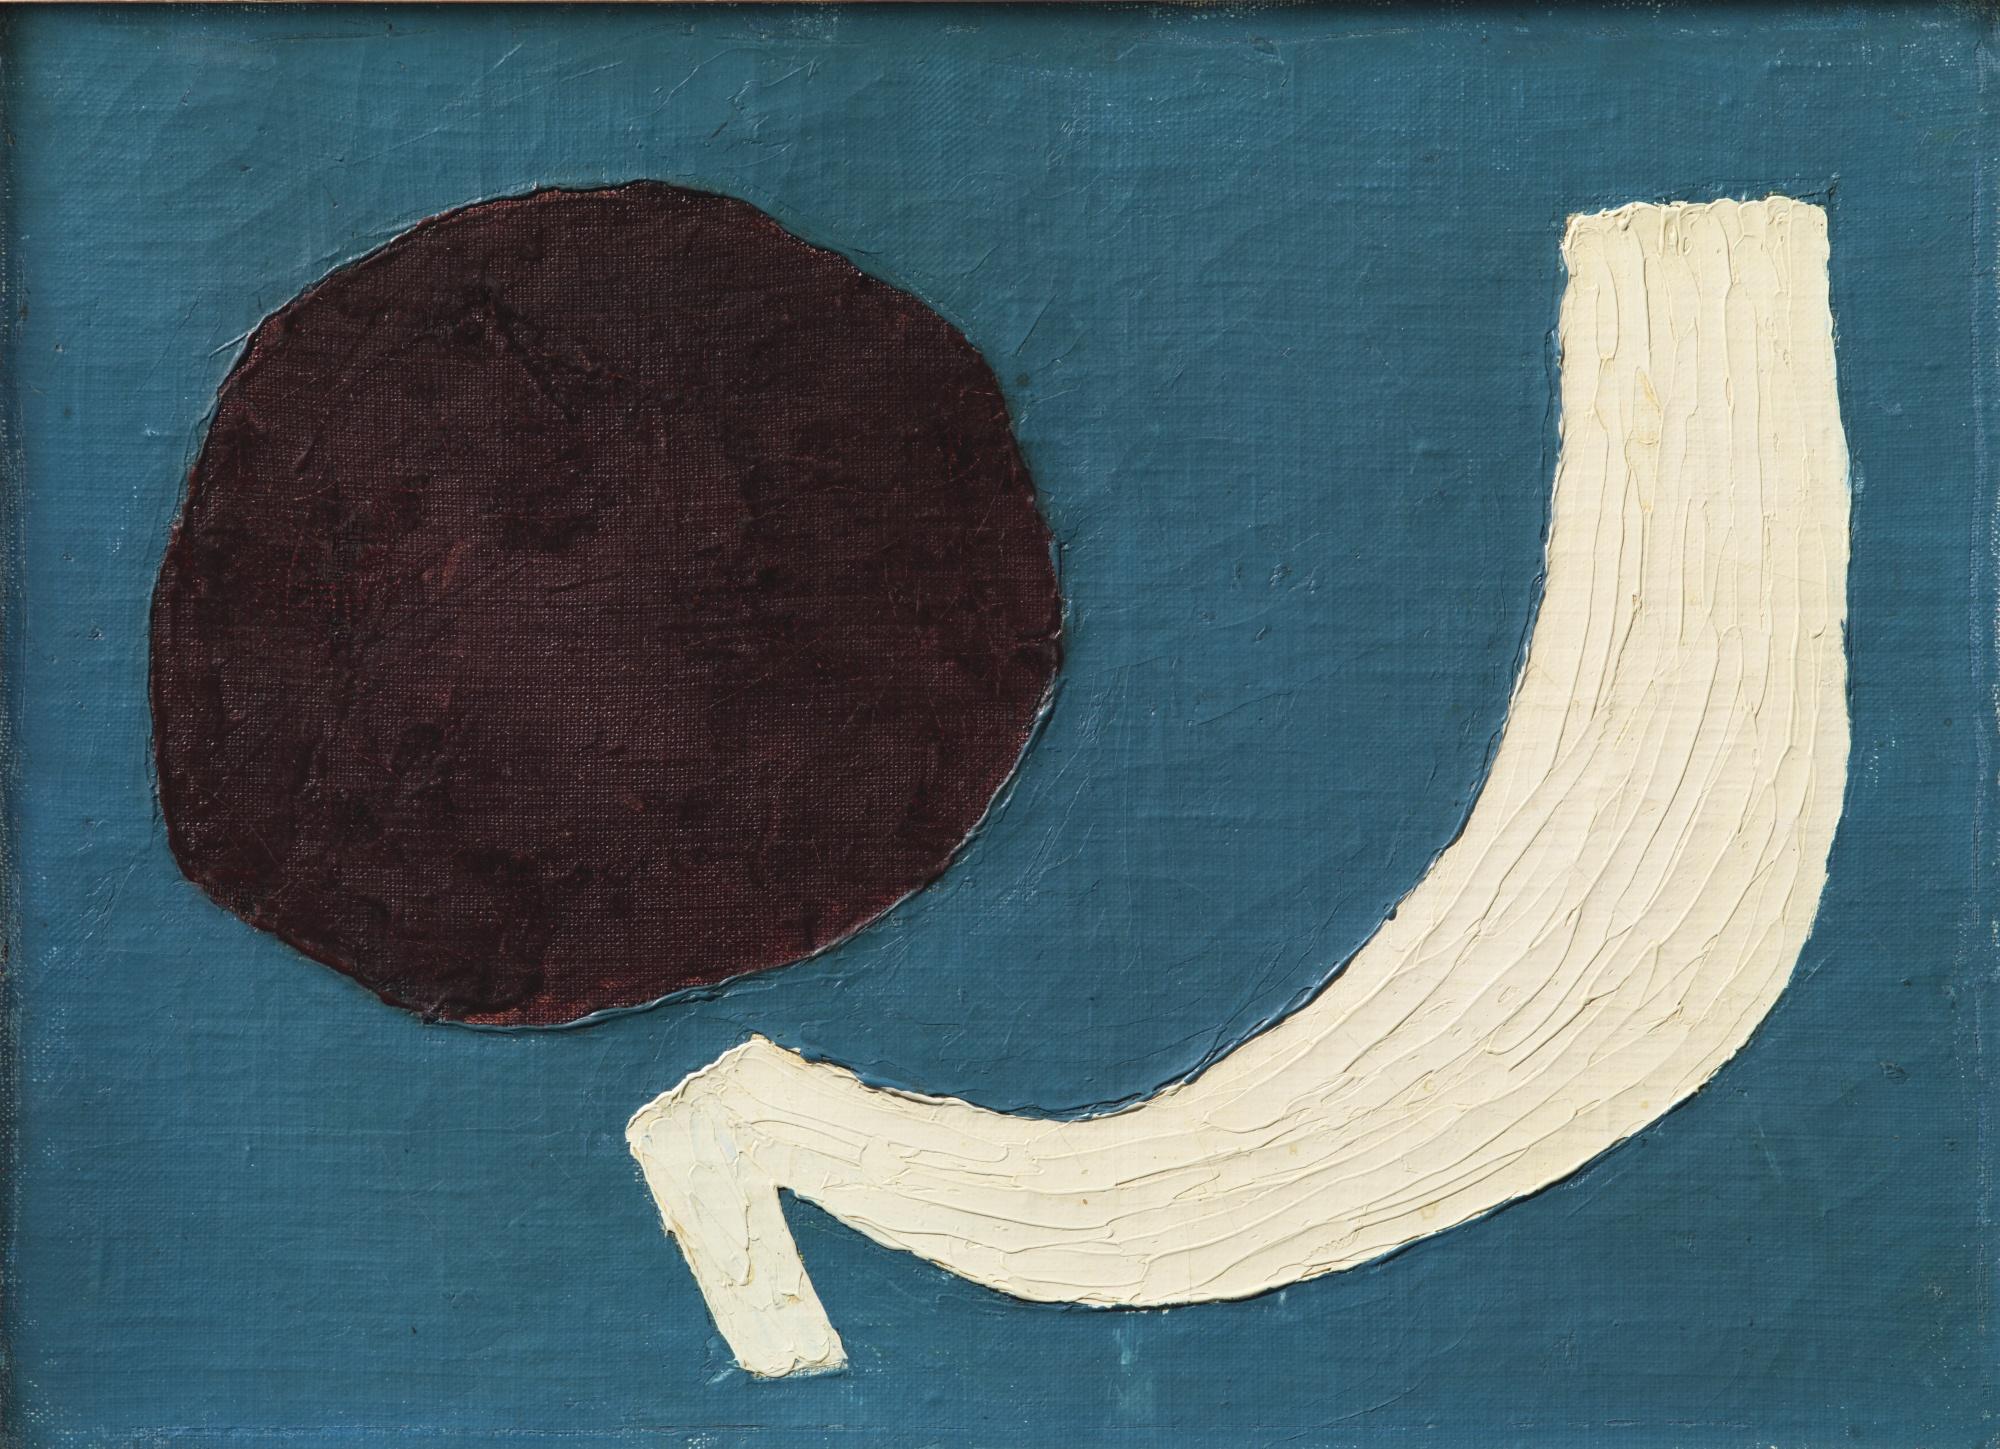 Takeo Yamaguchi-Work-1955